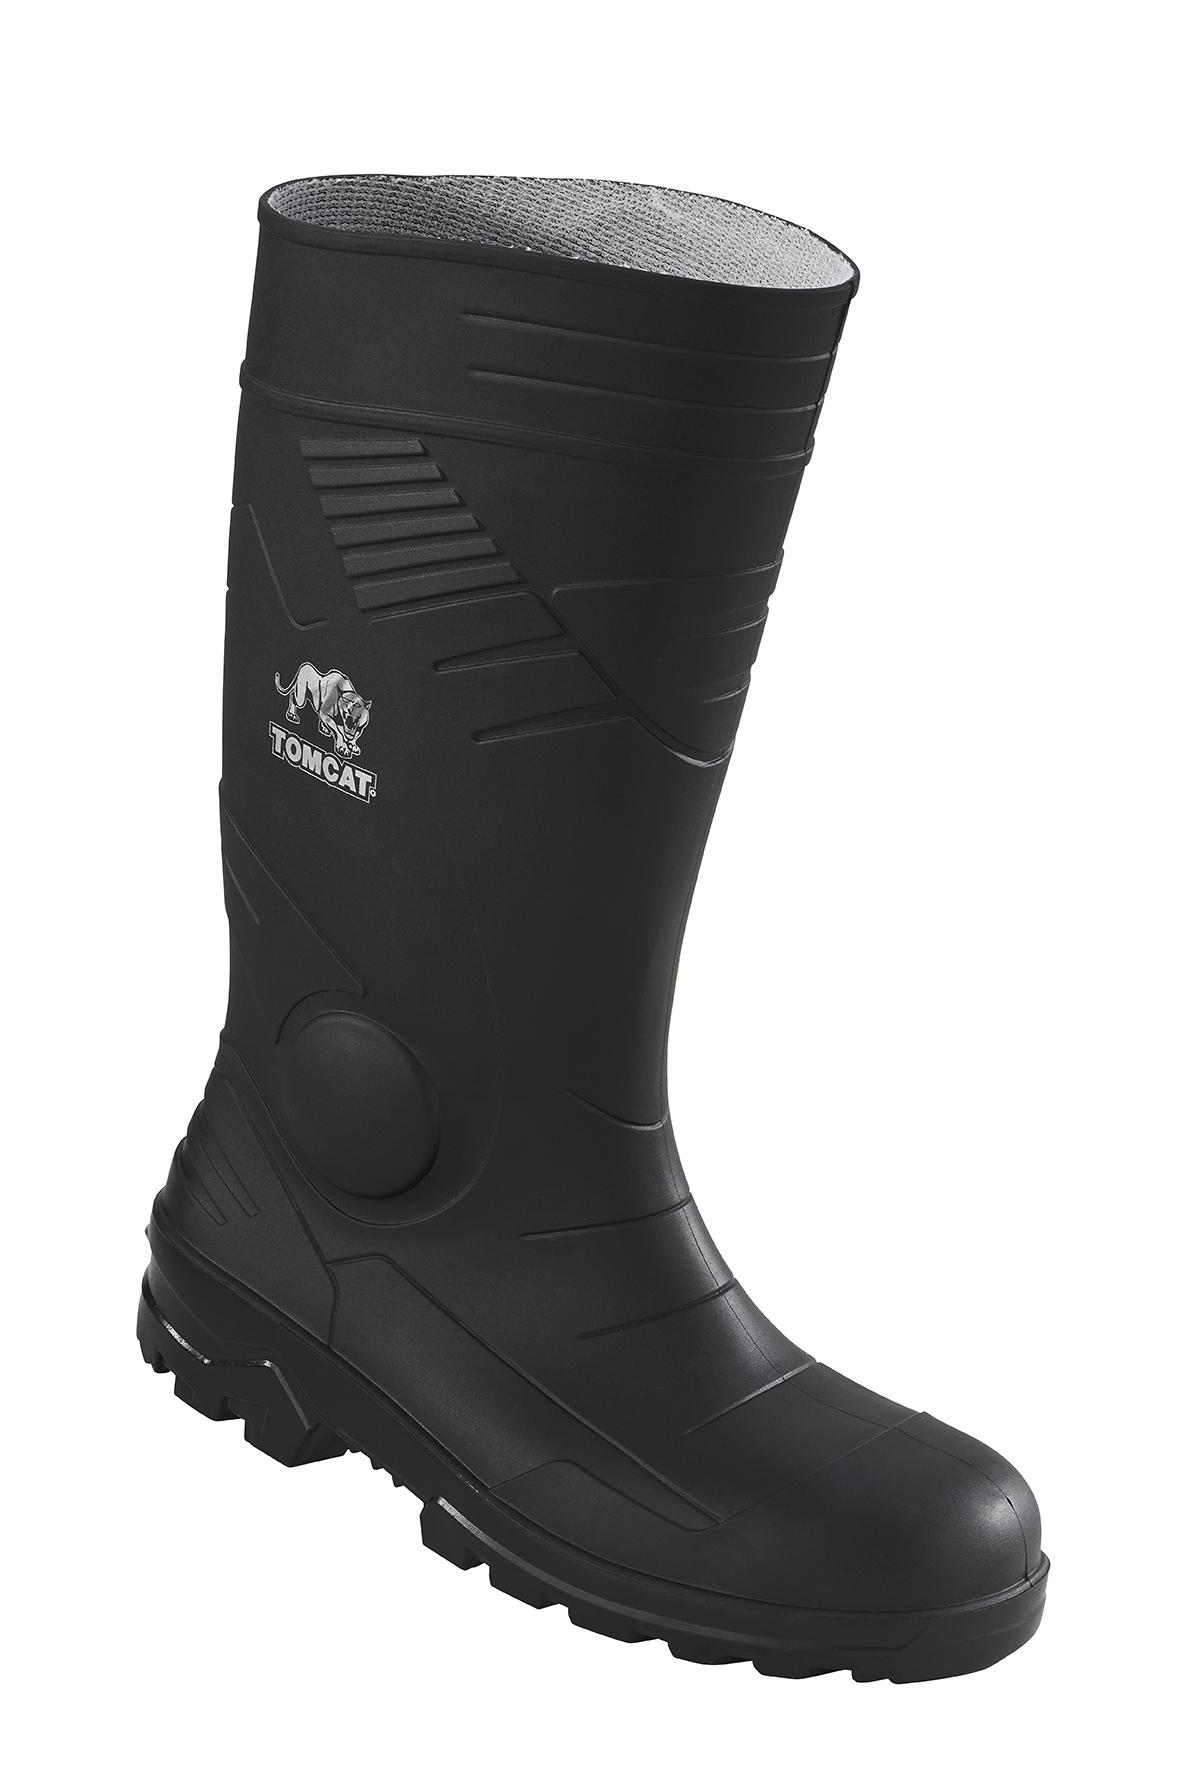 2ba8bb7dc65 Tomcat TC200 Full Safety S5 Steel Toe Cap Wellington Boots